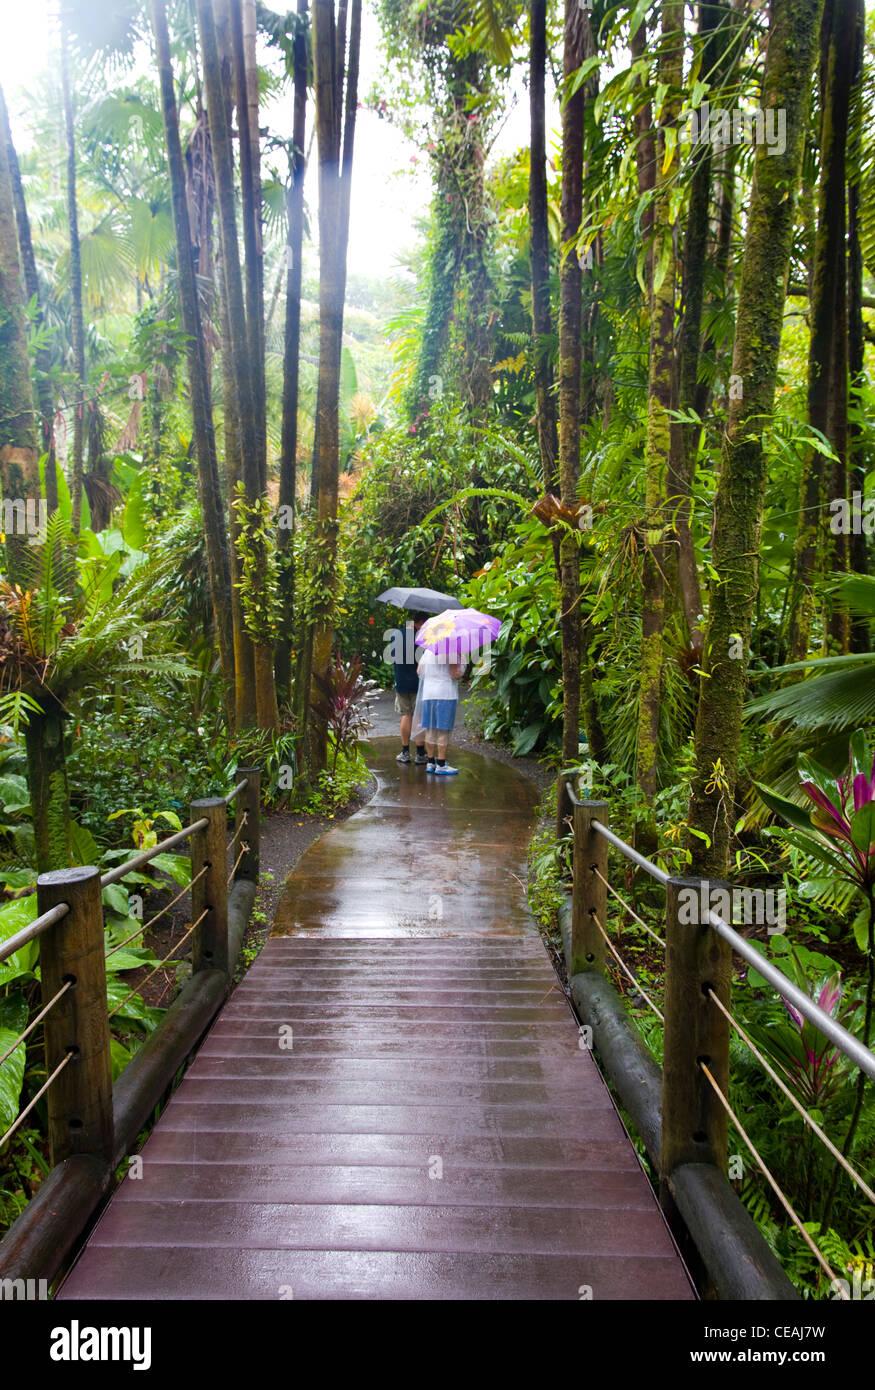 Hawaii Tropical Botanical Garden, Hilo, Big Island, Hawaii - Stock Image